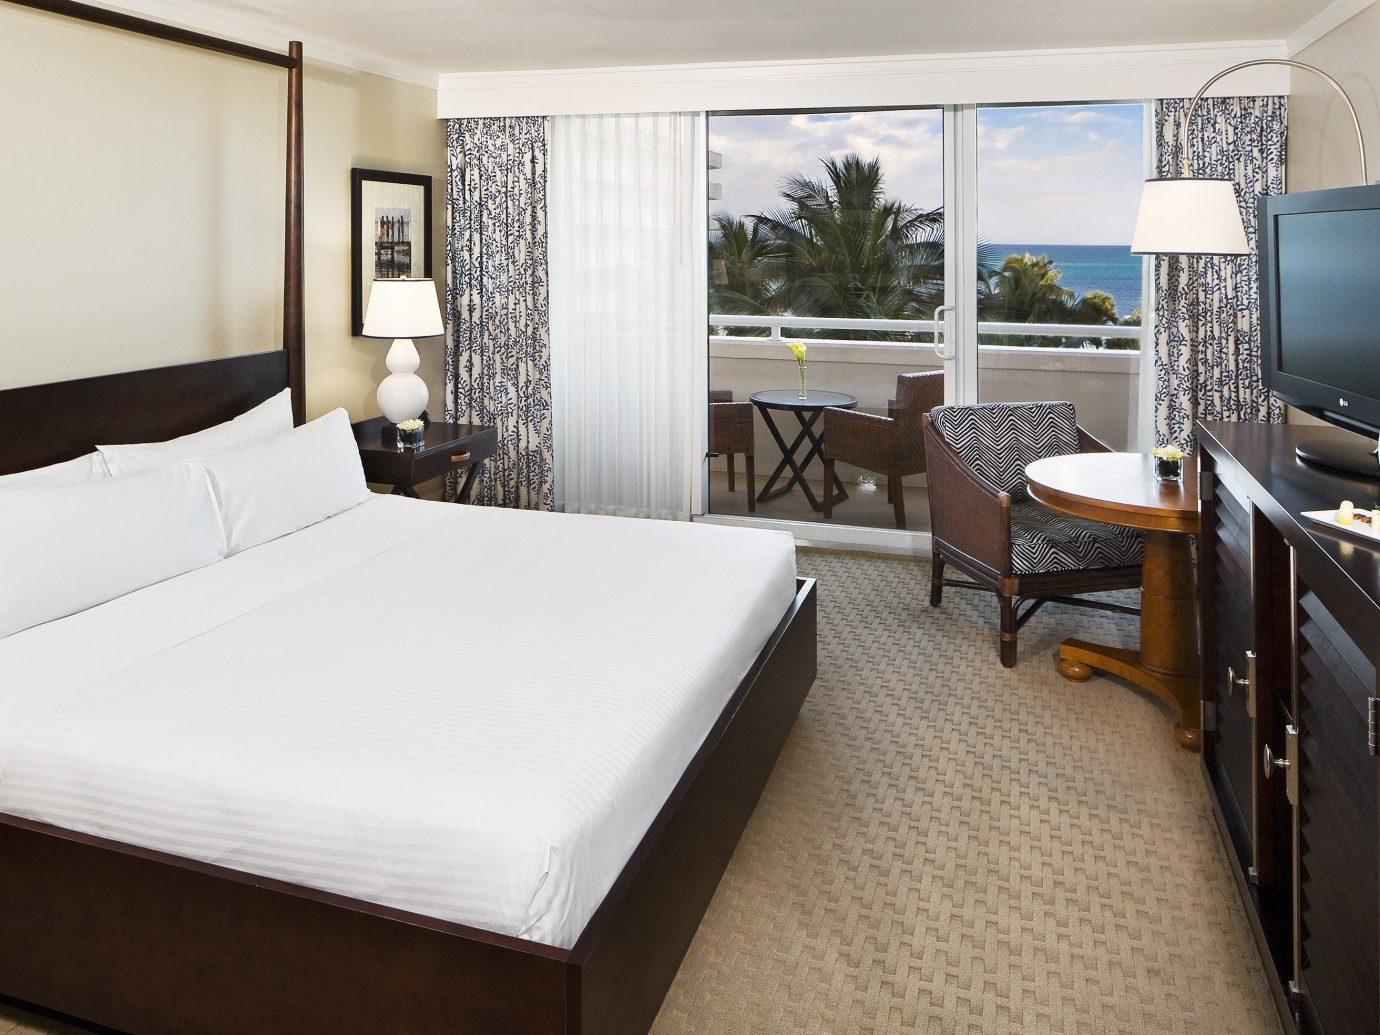 Bedroom at Meliá Nassau Beach